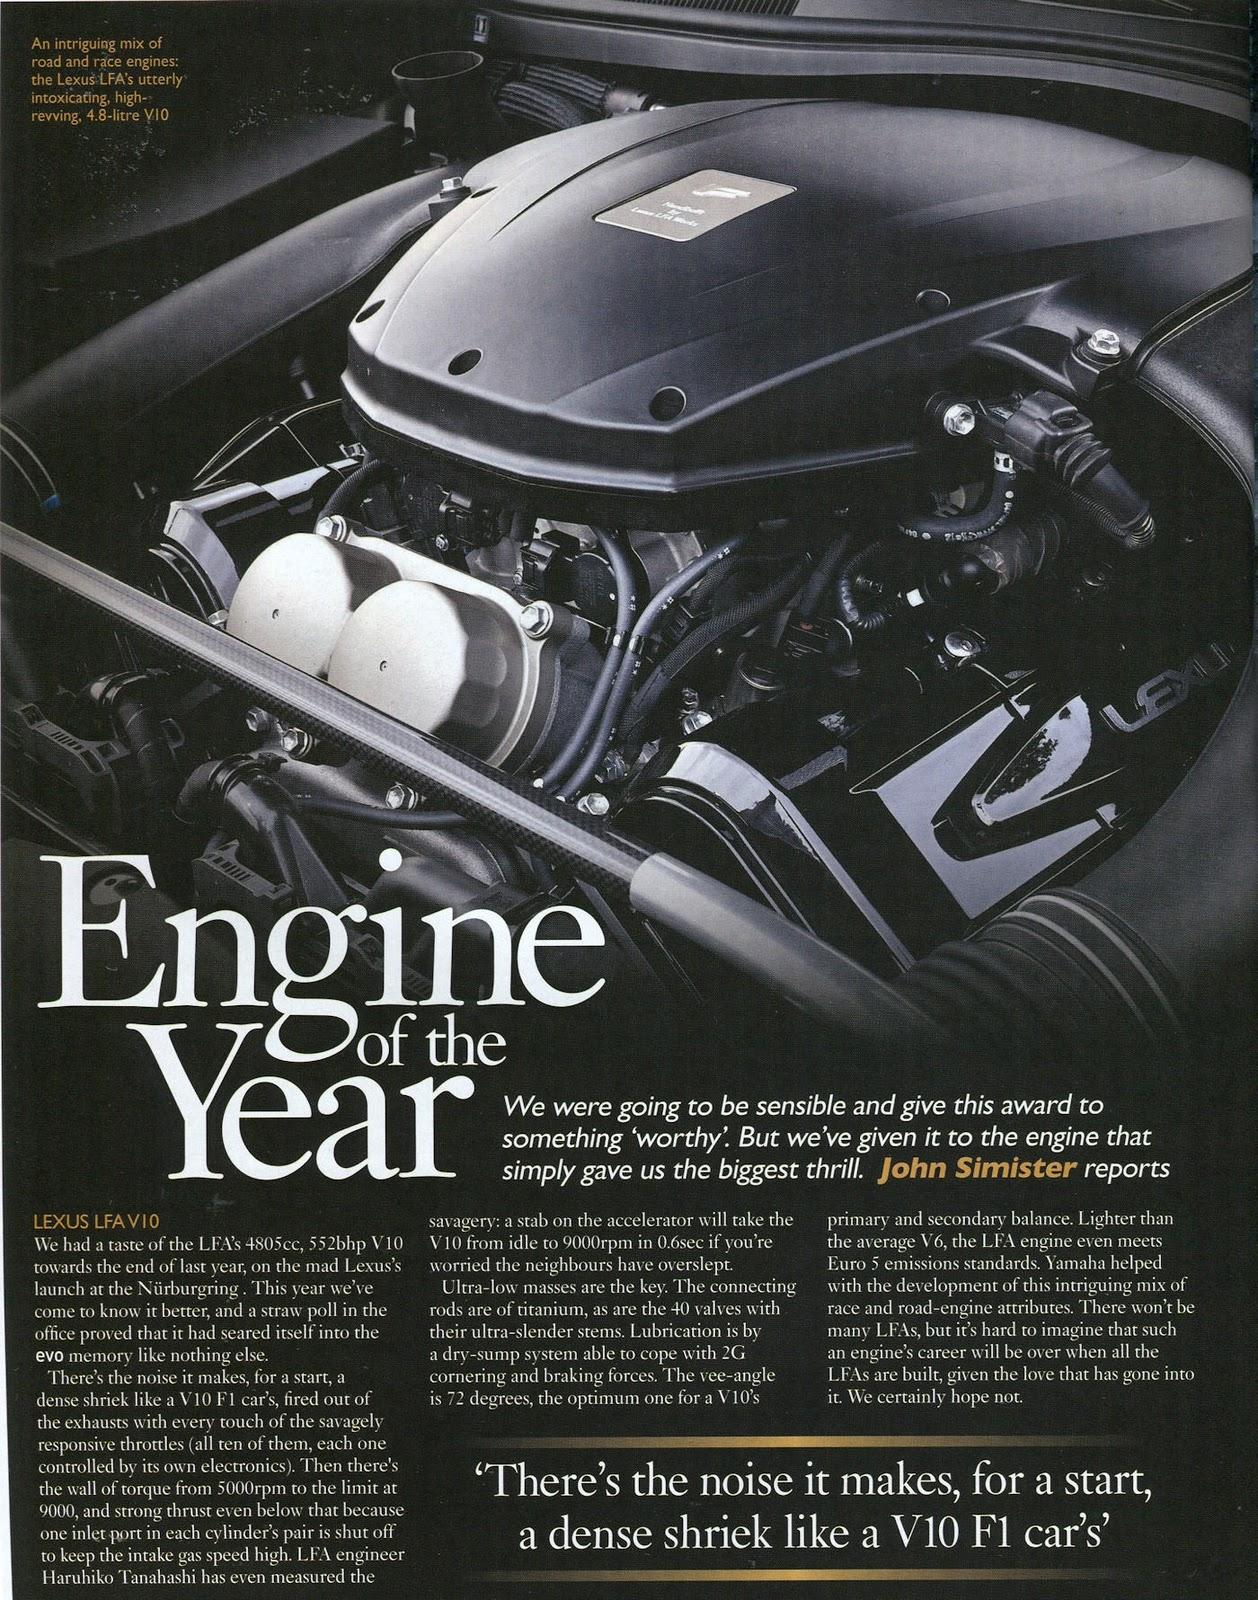 lfa s v10 engine wins best engine of the year award by evo uk  [ 1258 x 1600 Pixel ]